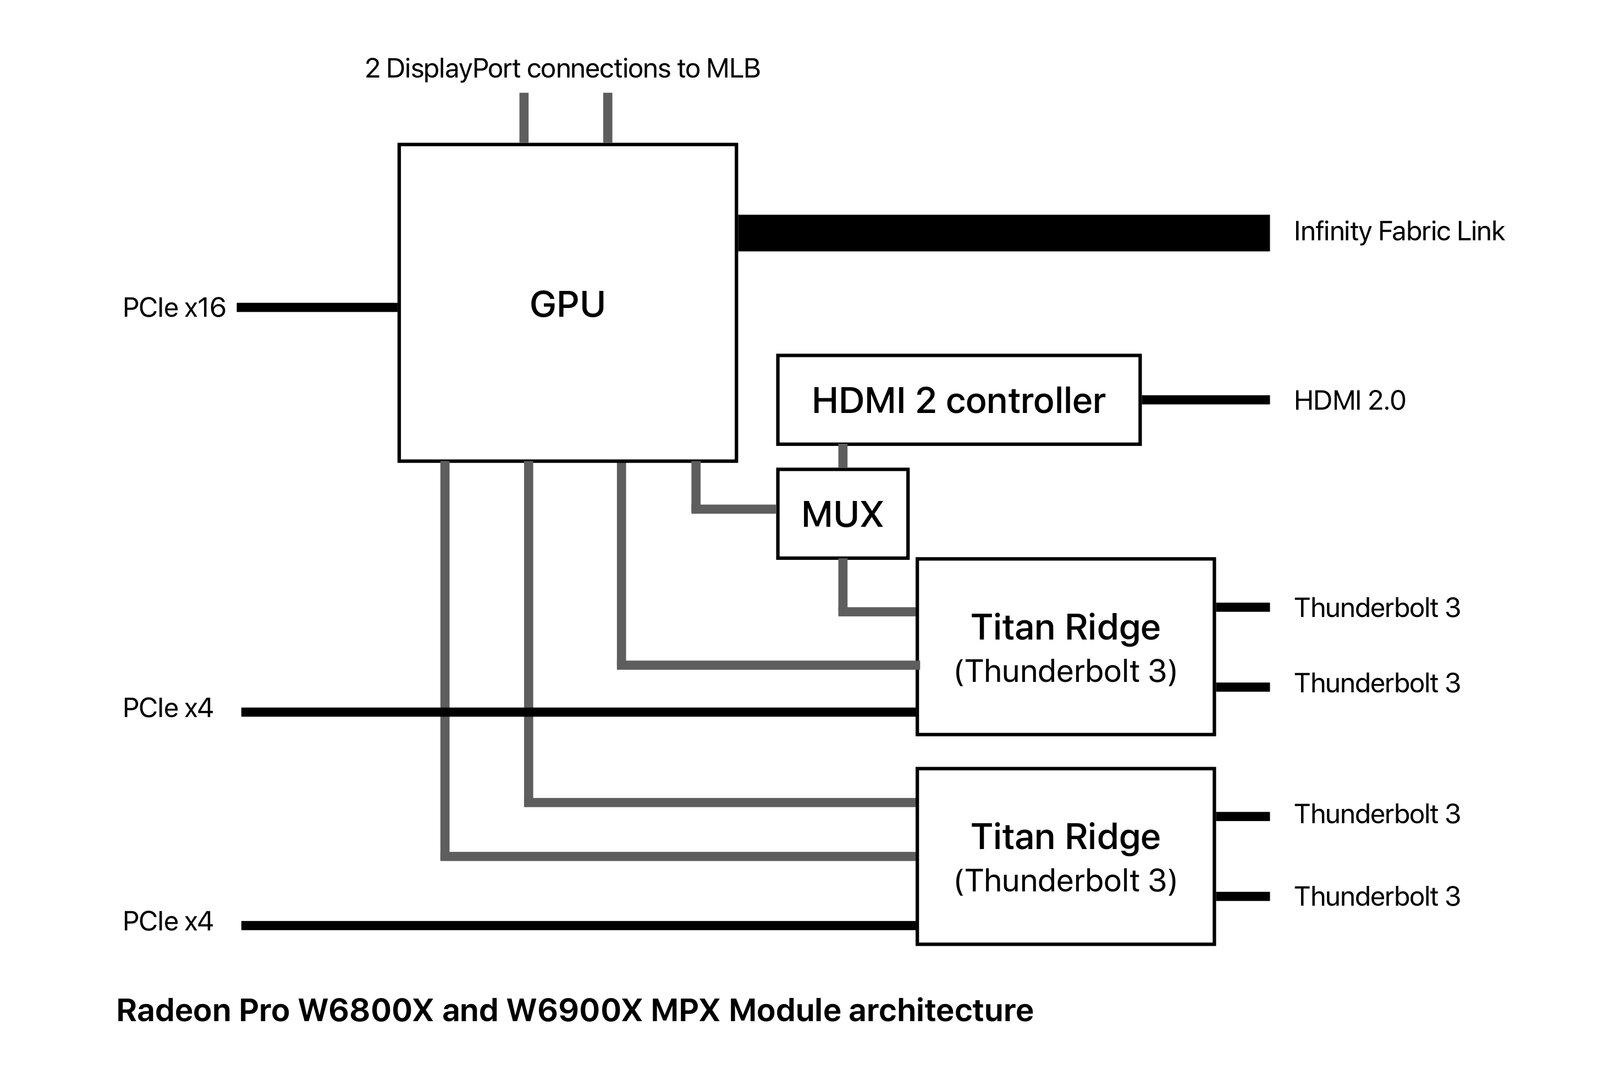 Radeon Pro W6800X and W6900X architecture